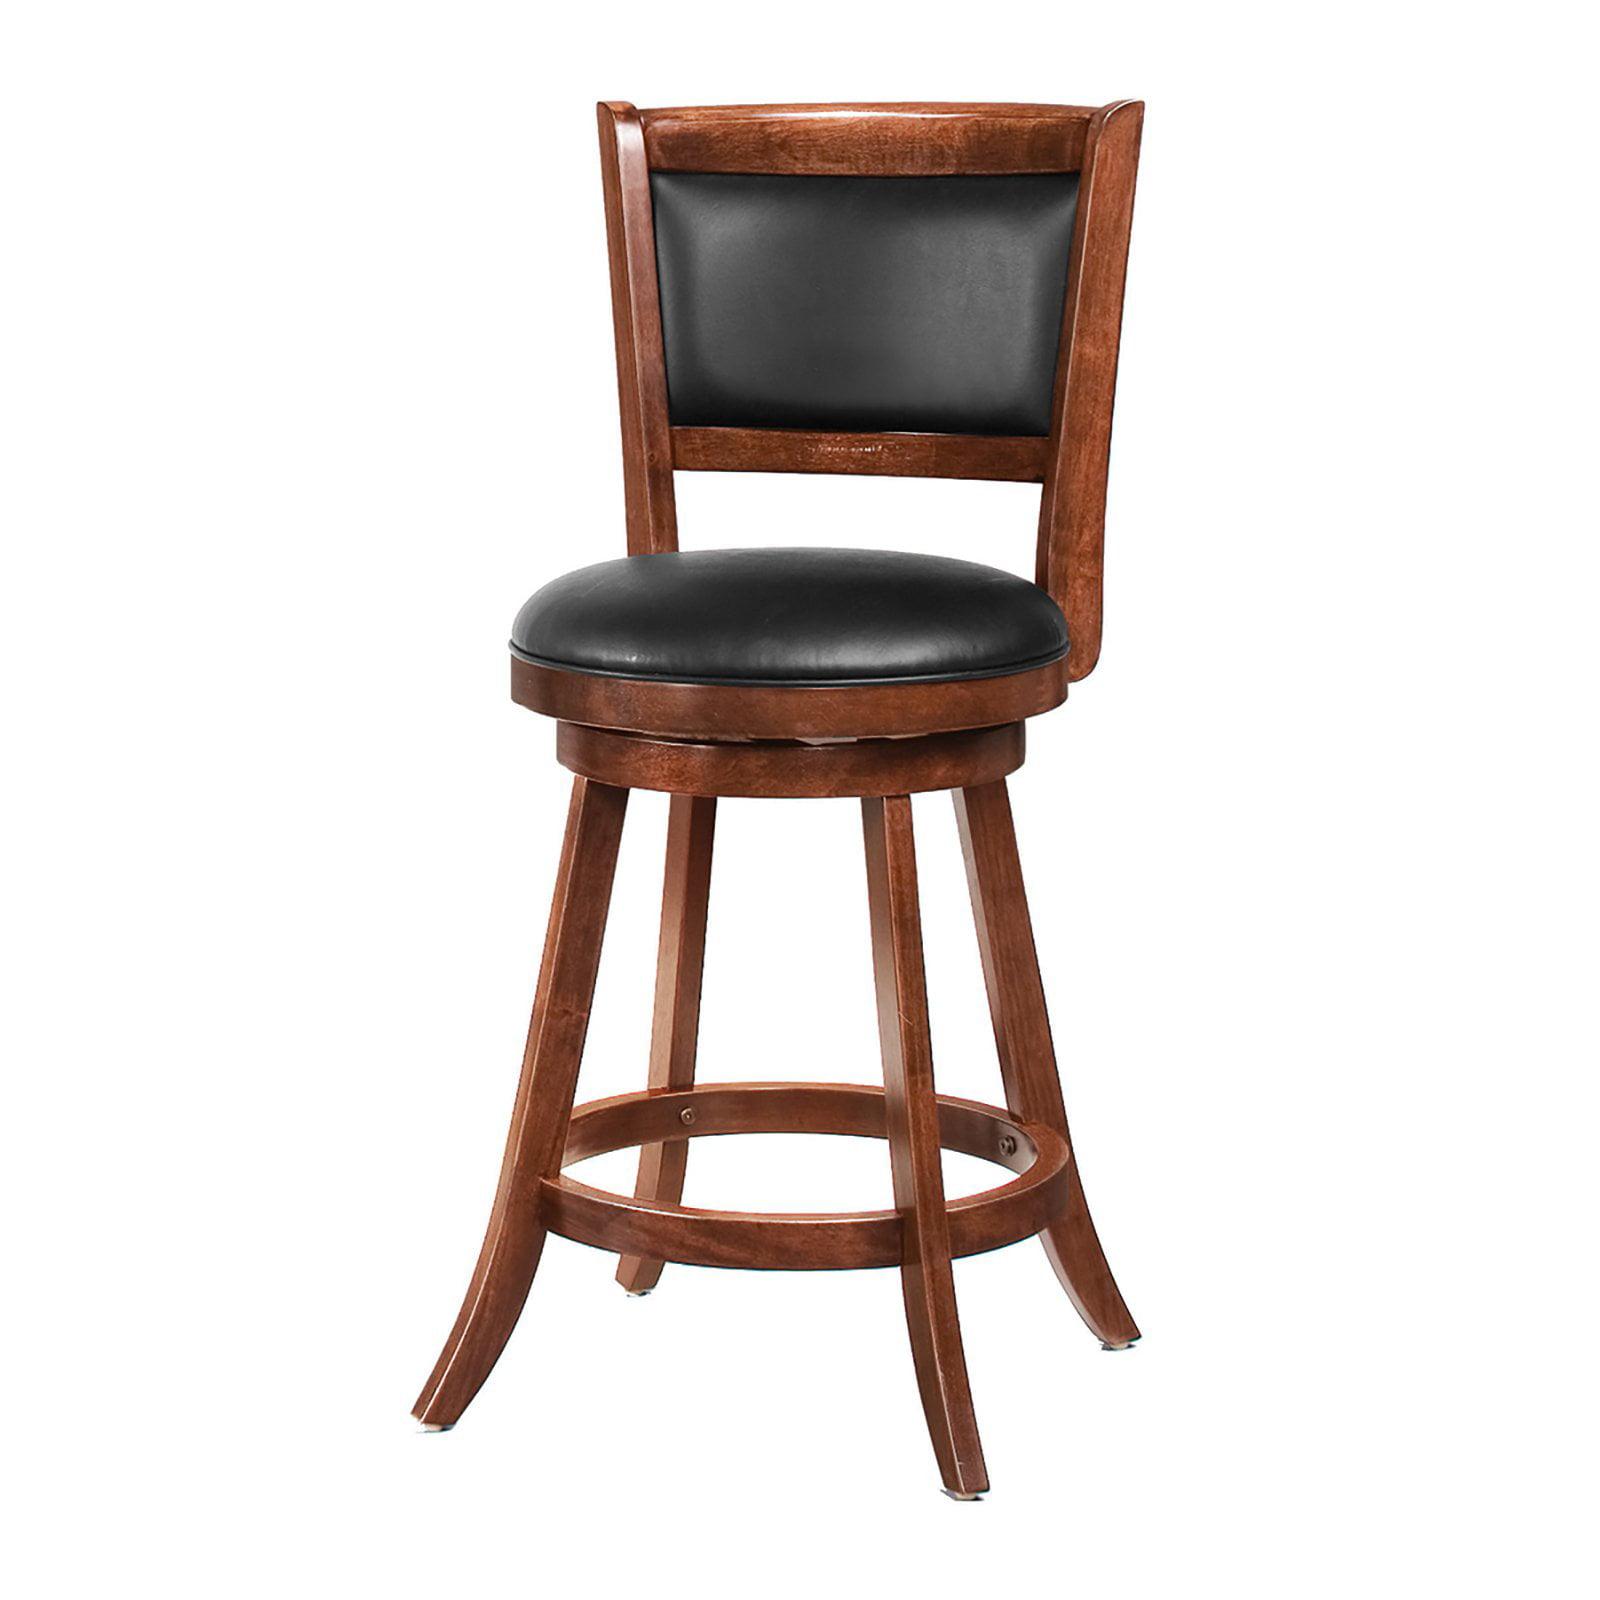 Coaster Furniture Corning Swivel Bar Stool - Set of 2